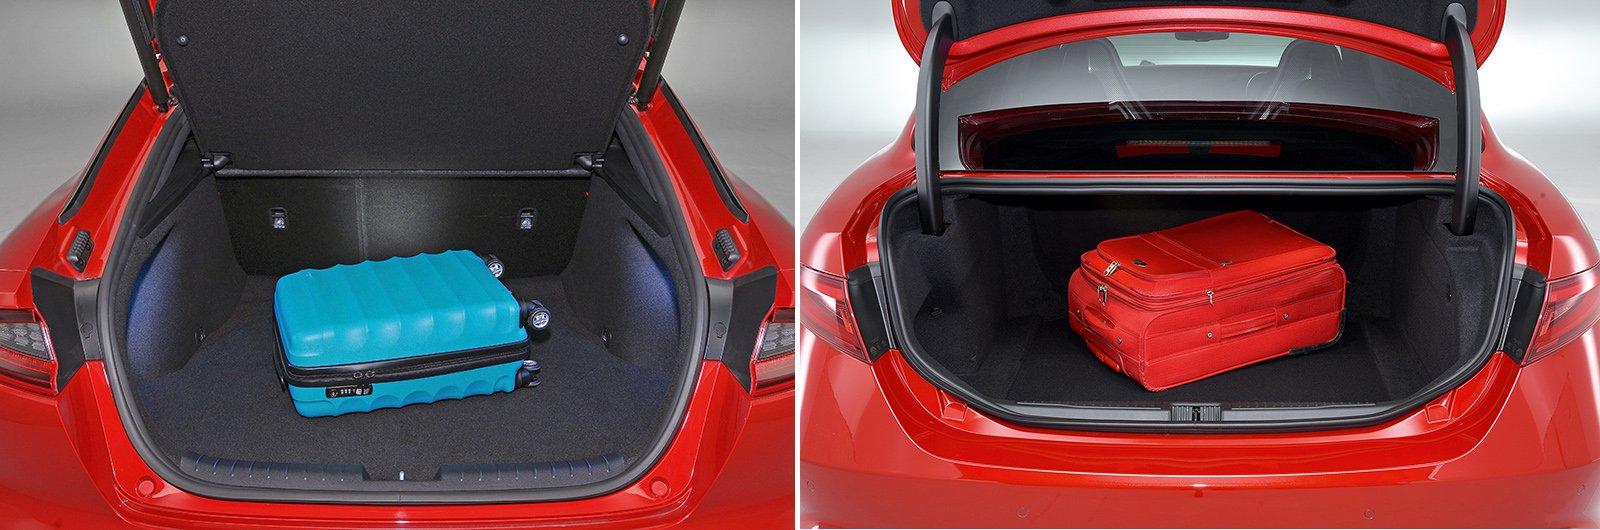 New Kia Stinger vs used Alfa Romeo Giulia Quadrifoglio: which is best?